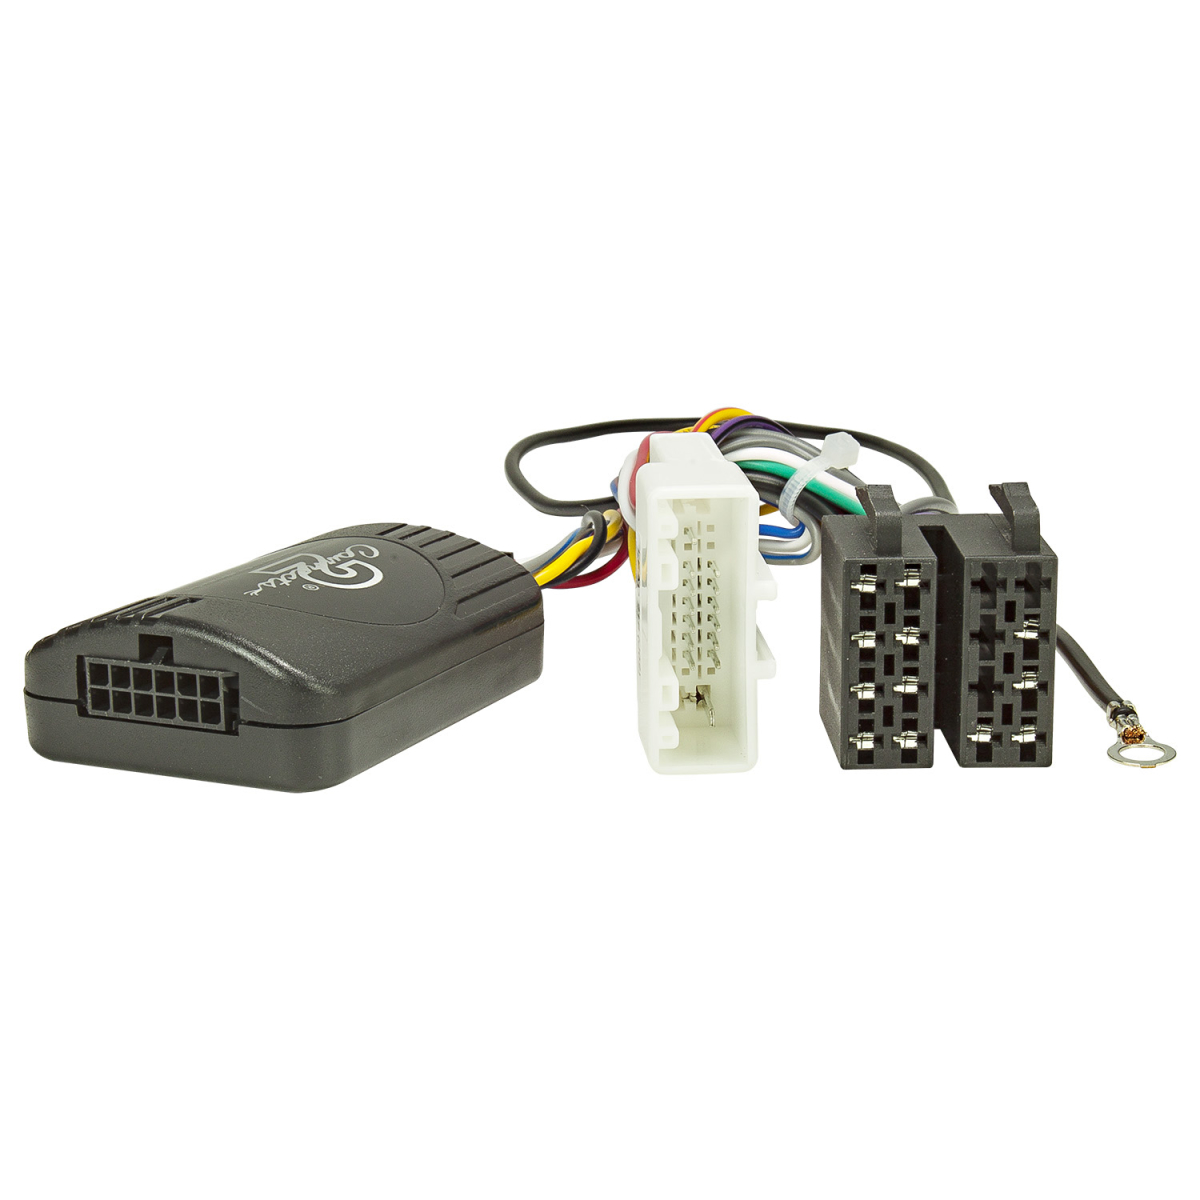 lenkradfernbedienungsadapter für nissan micra, juke, sunny, pulse, ve